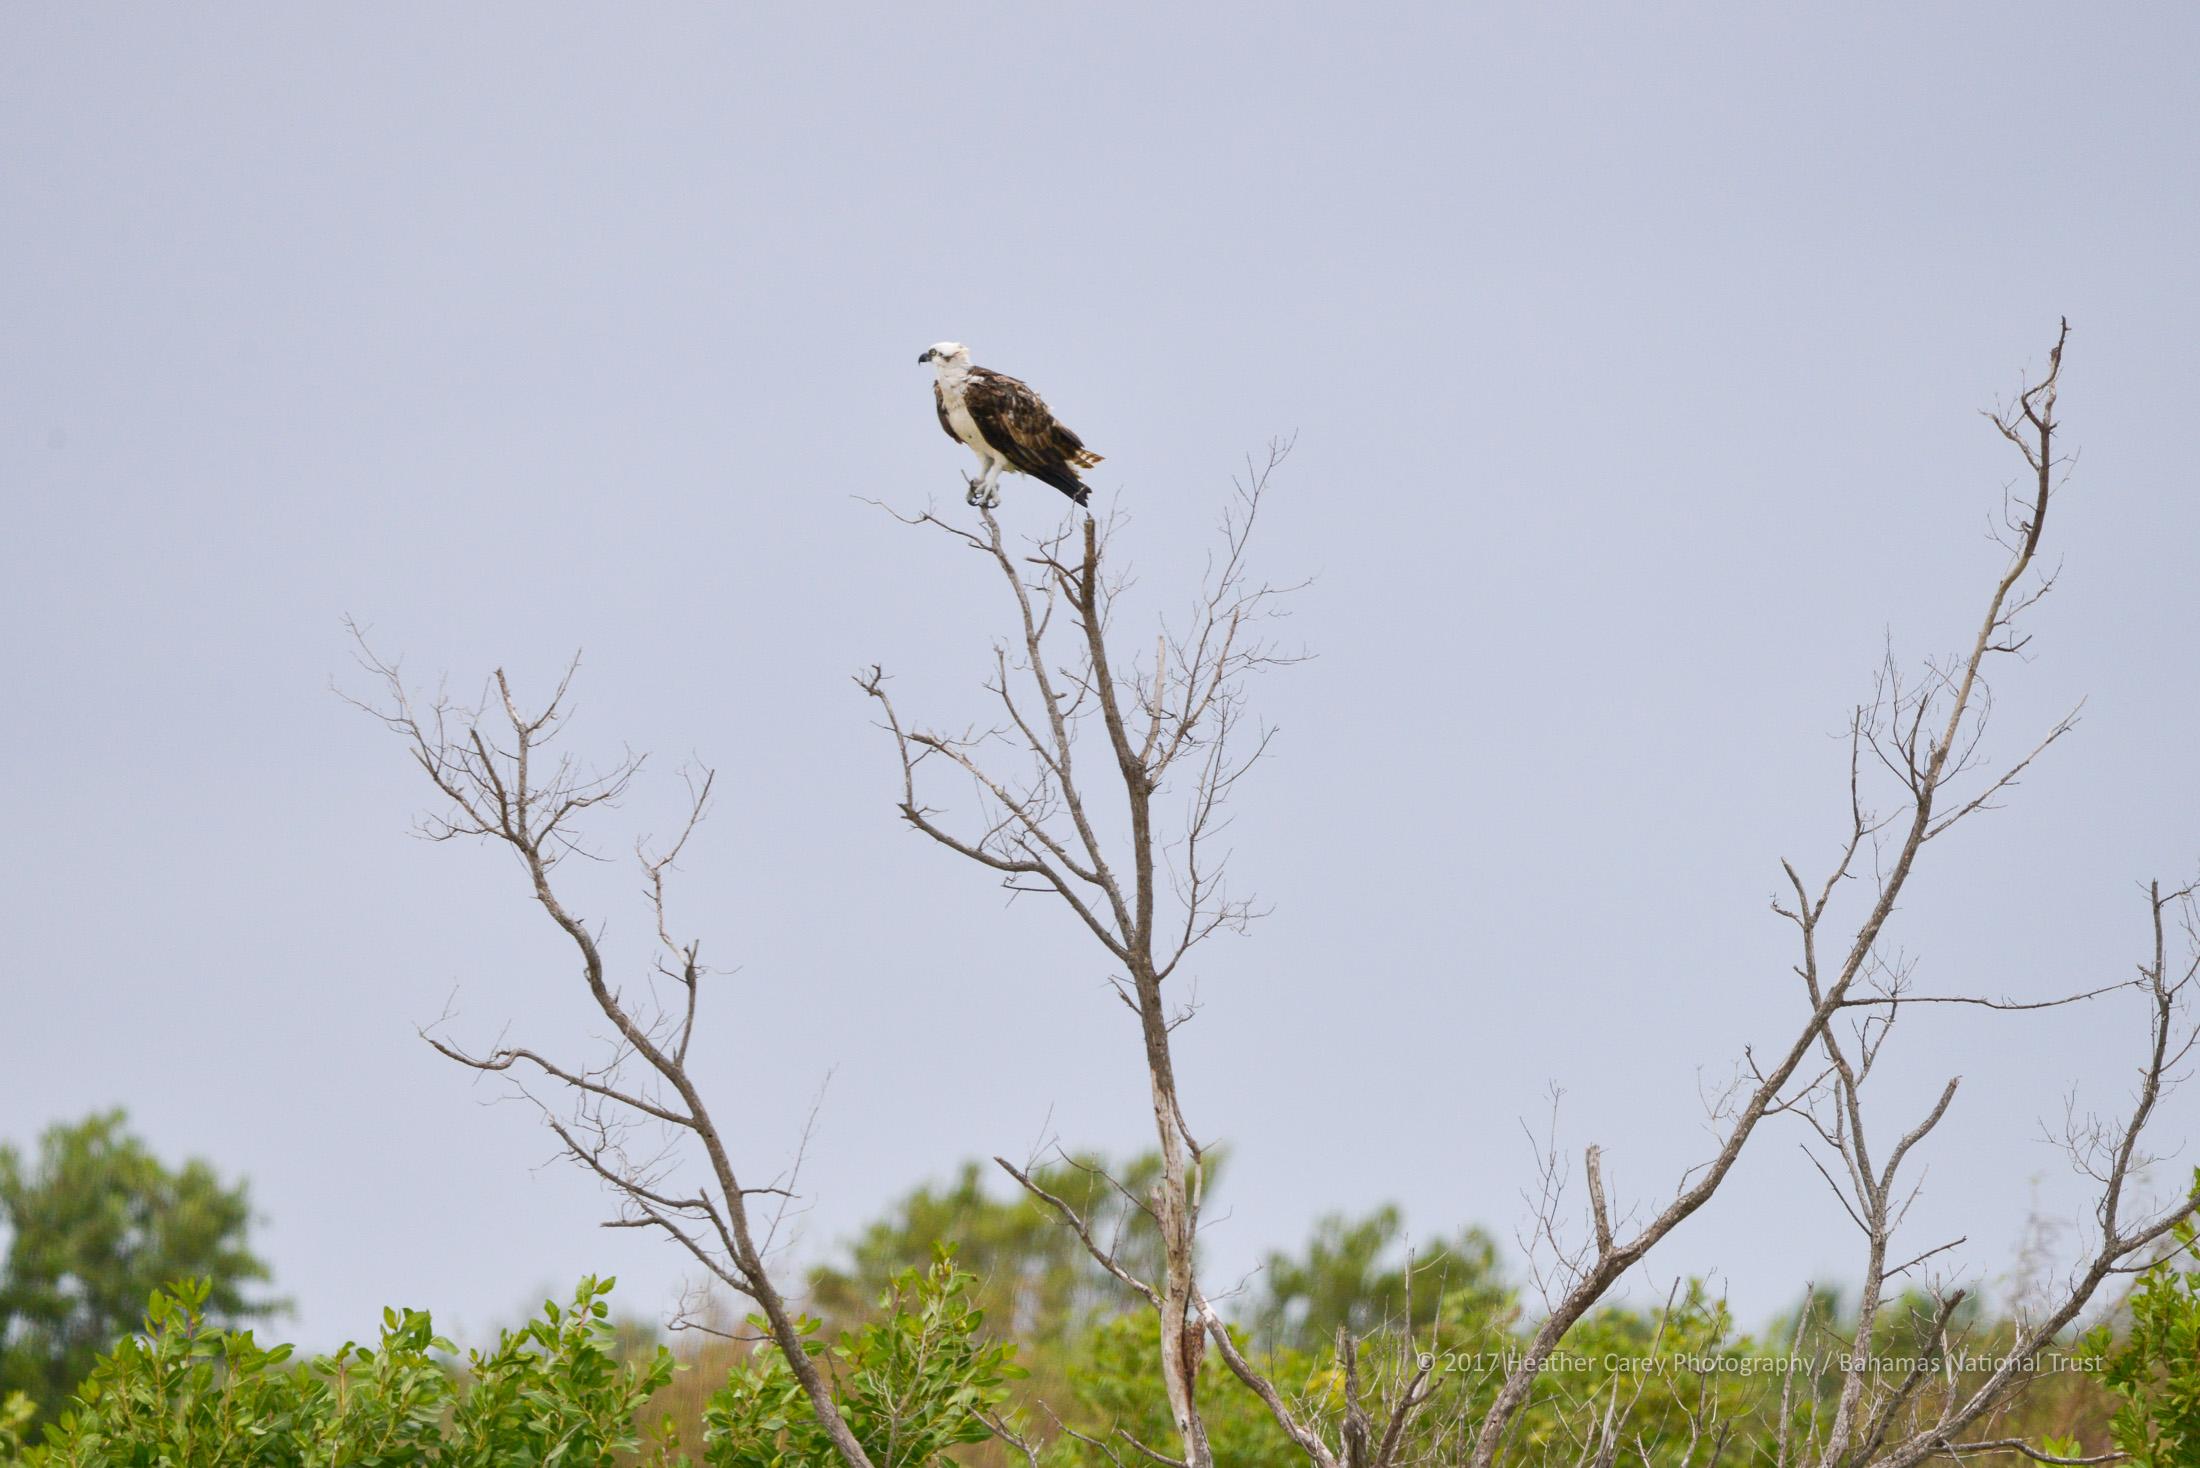 Inagua national park